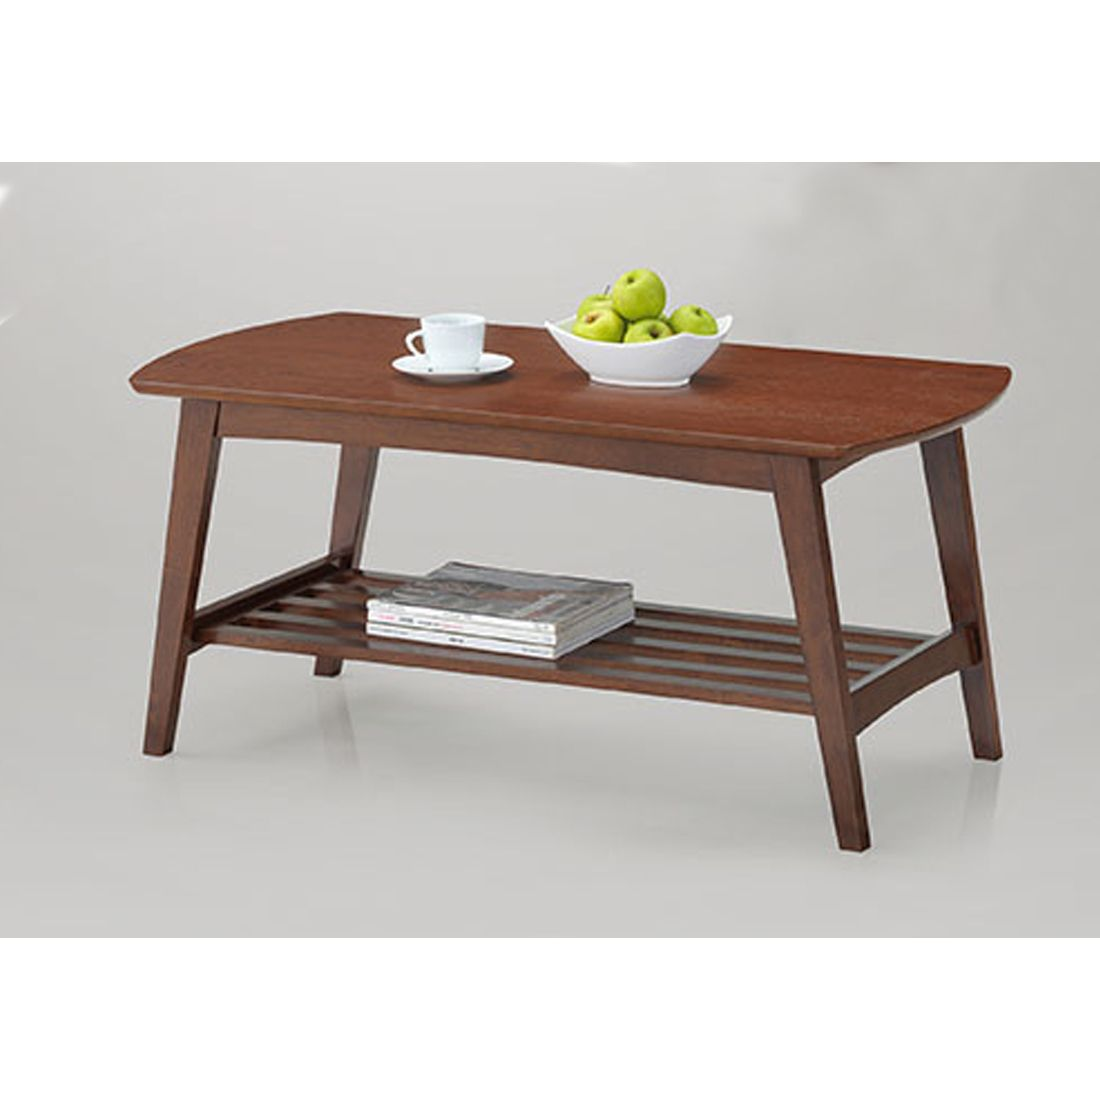 craigslist sacramento sofa table sectional sofas leather white mid century modern scandinavian style dark